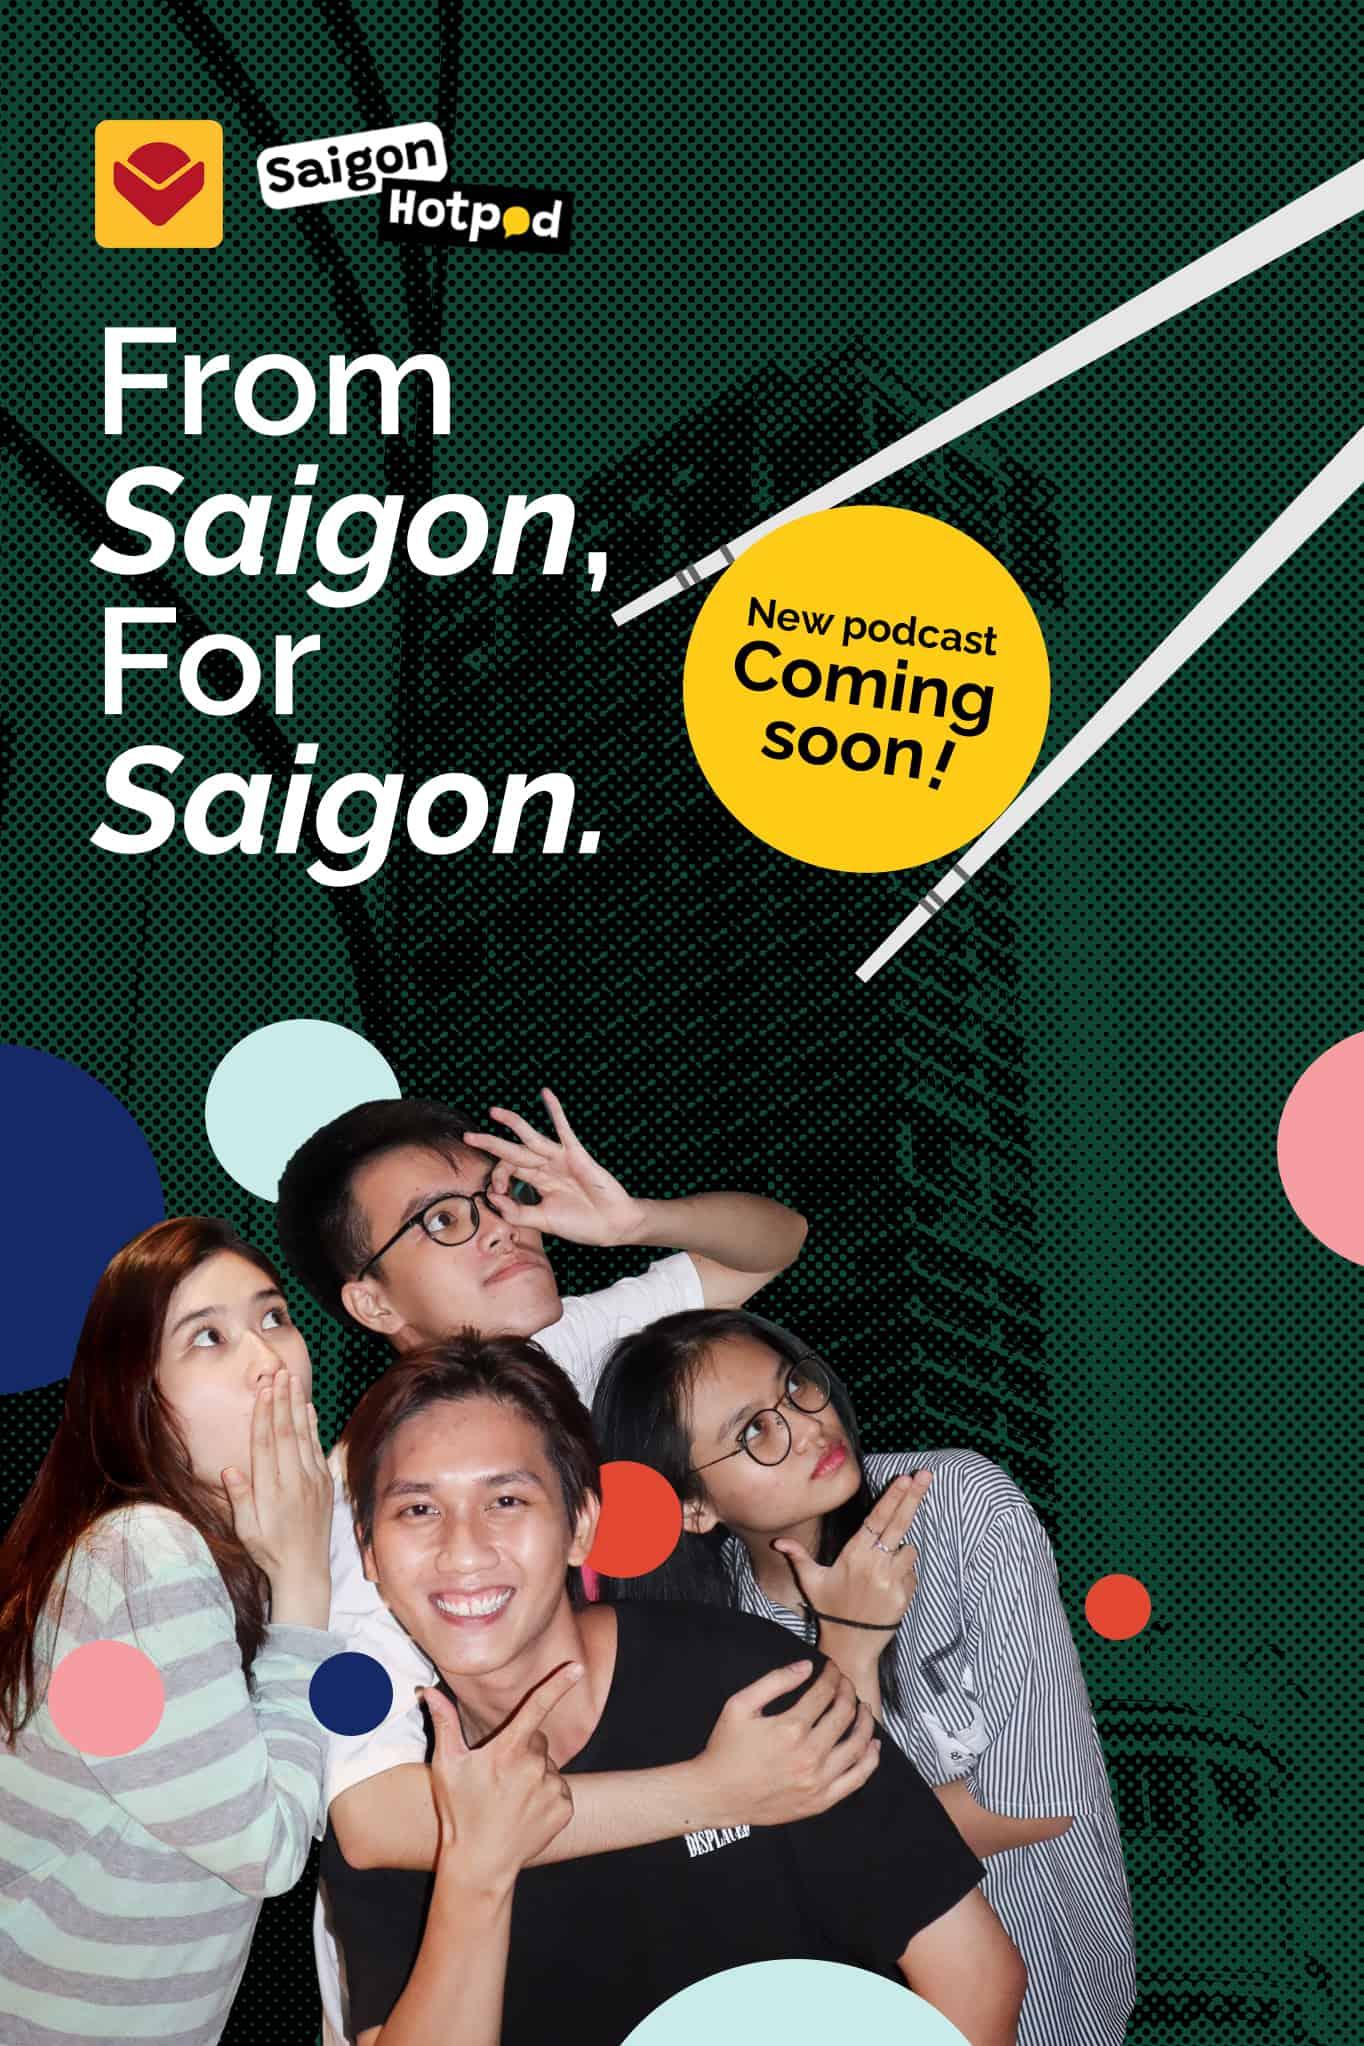 Podcast About Saigon